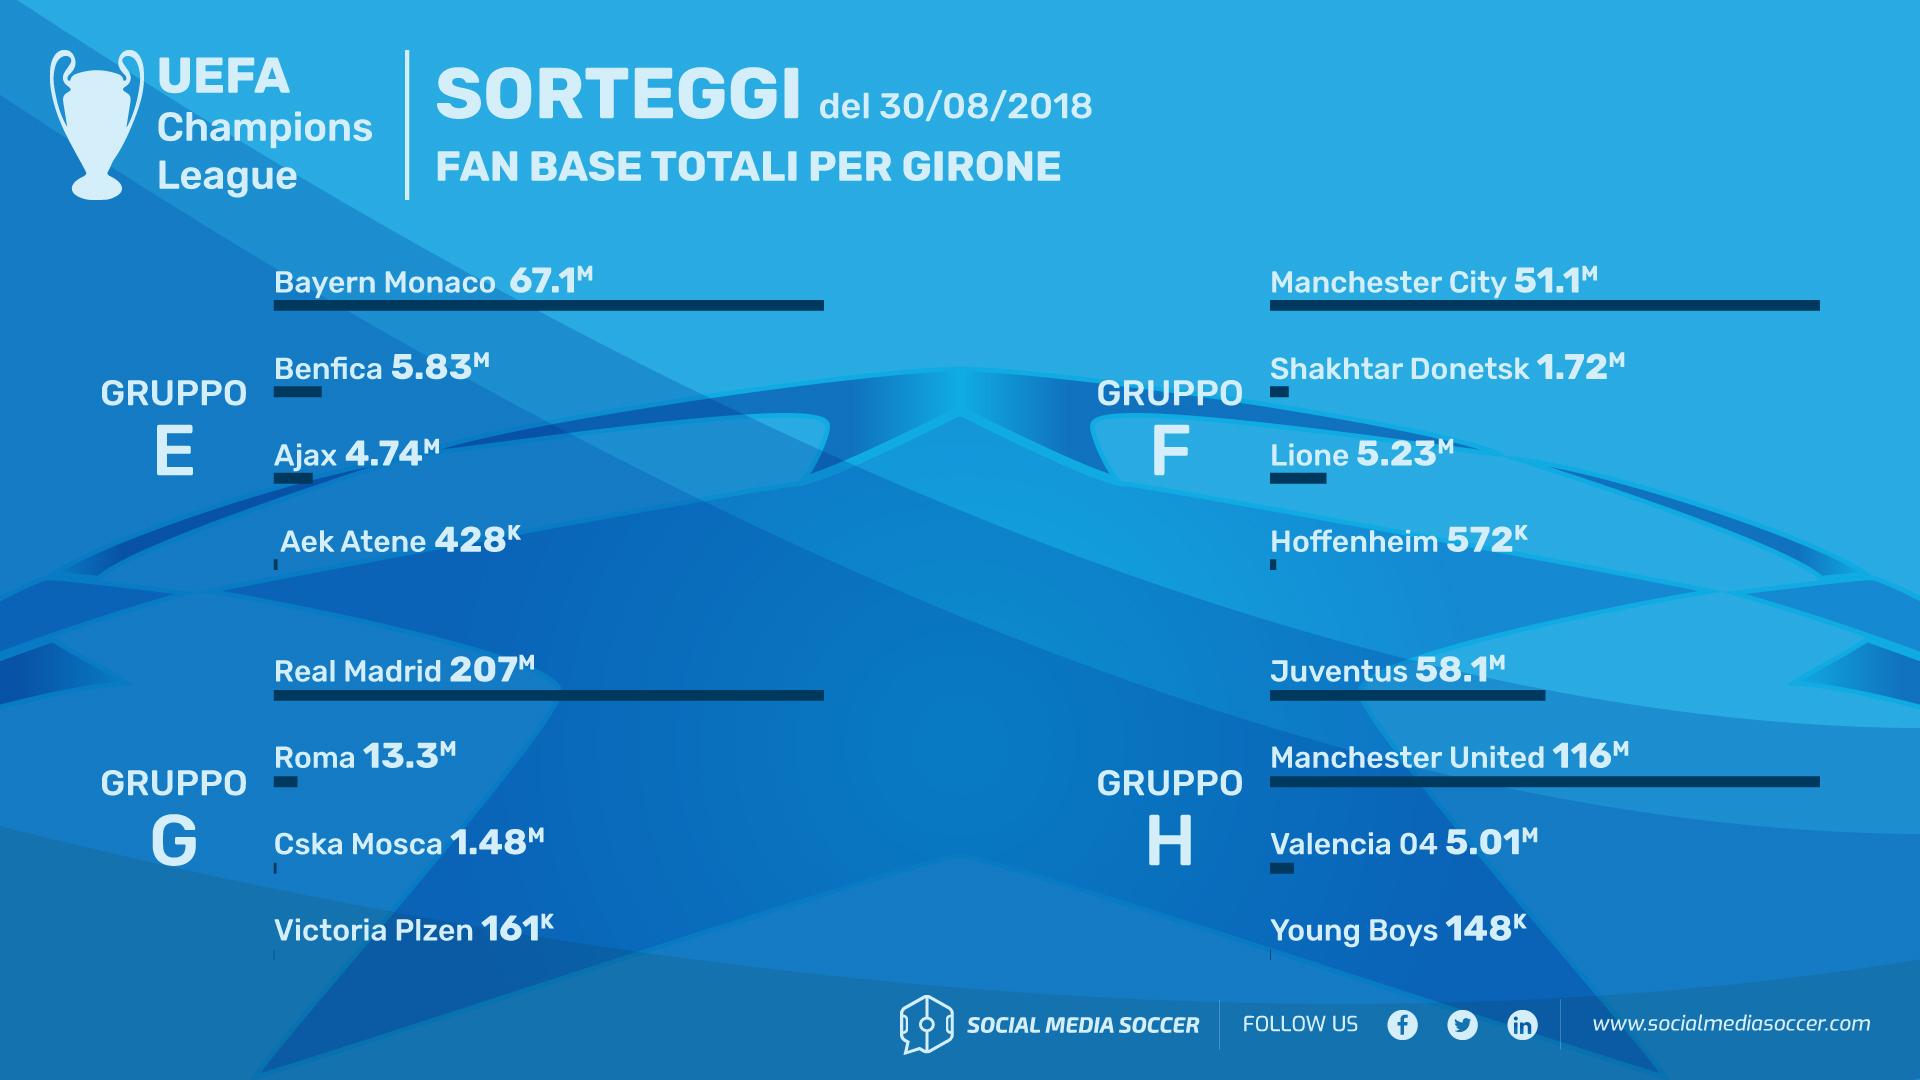 Guida social ai gironi di Champions League 2018/19 Gironi E-H